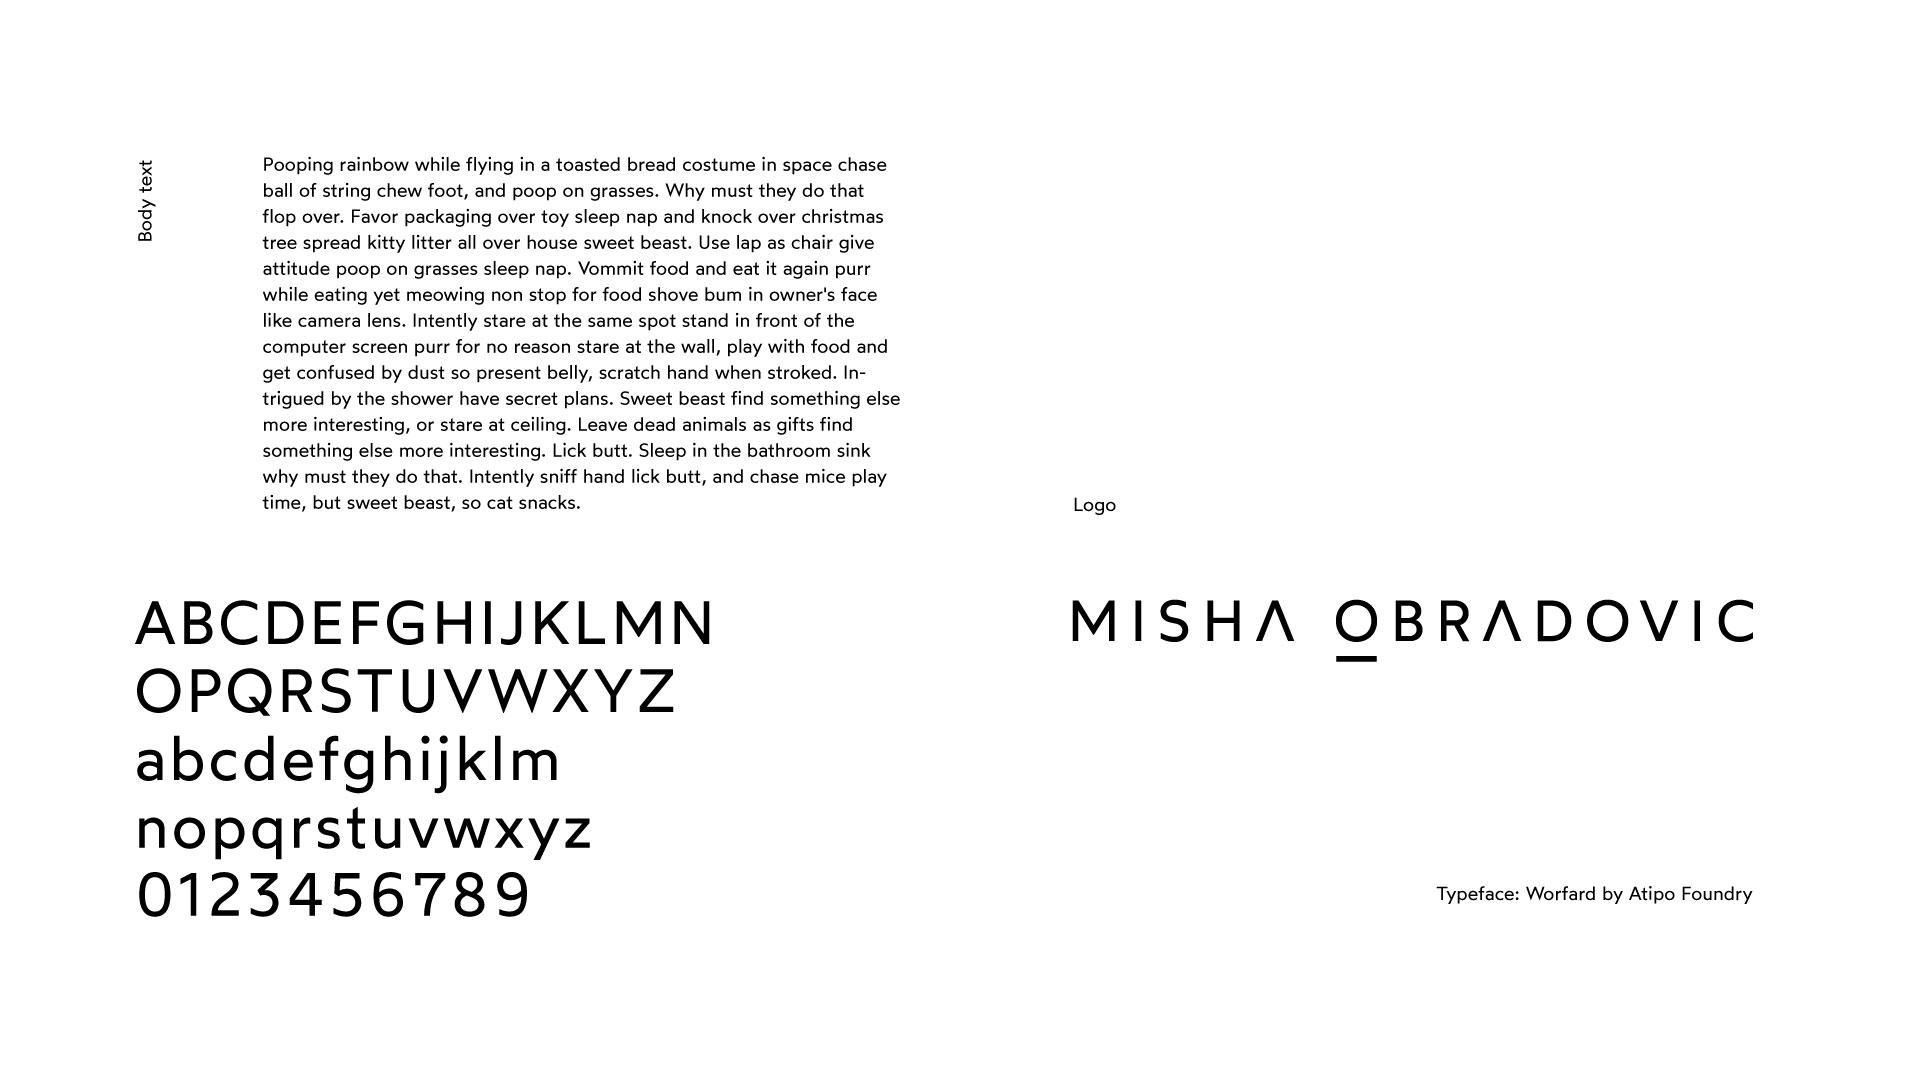 misha obradovic misa obradovic general condition studio belgrade photographer